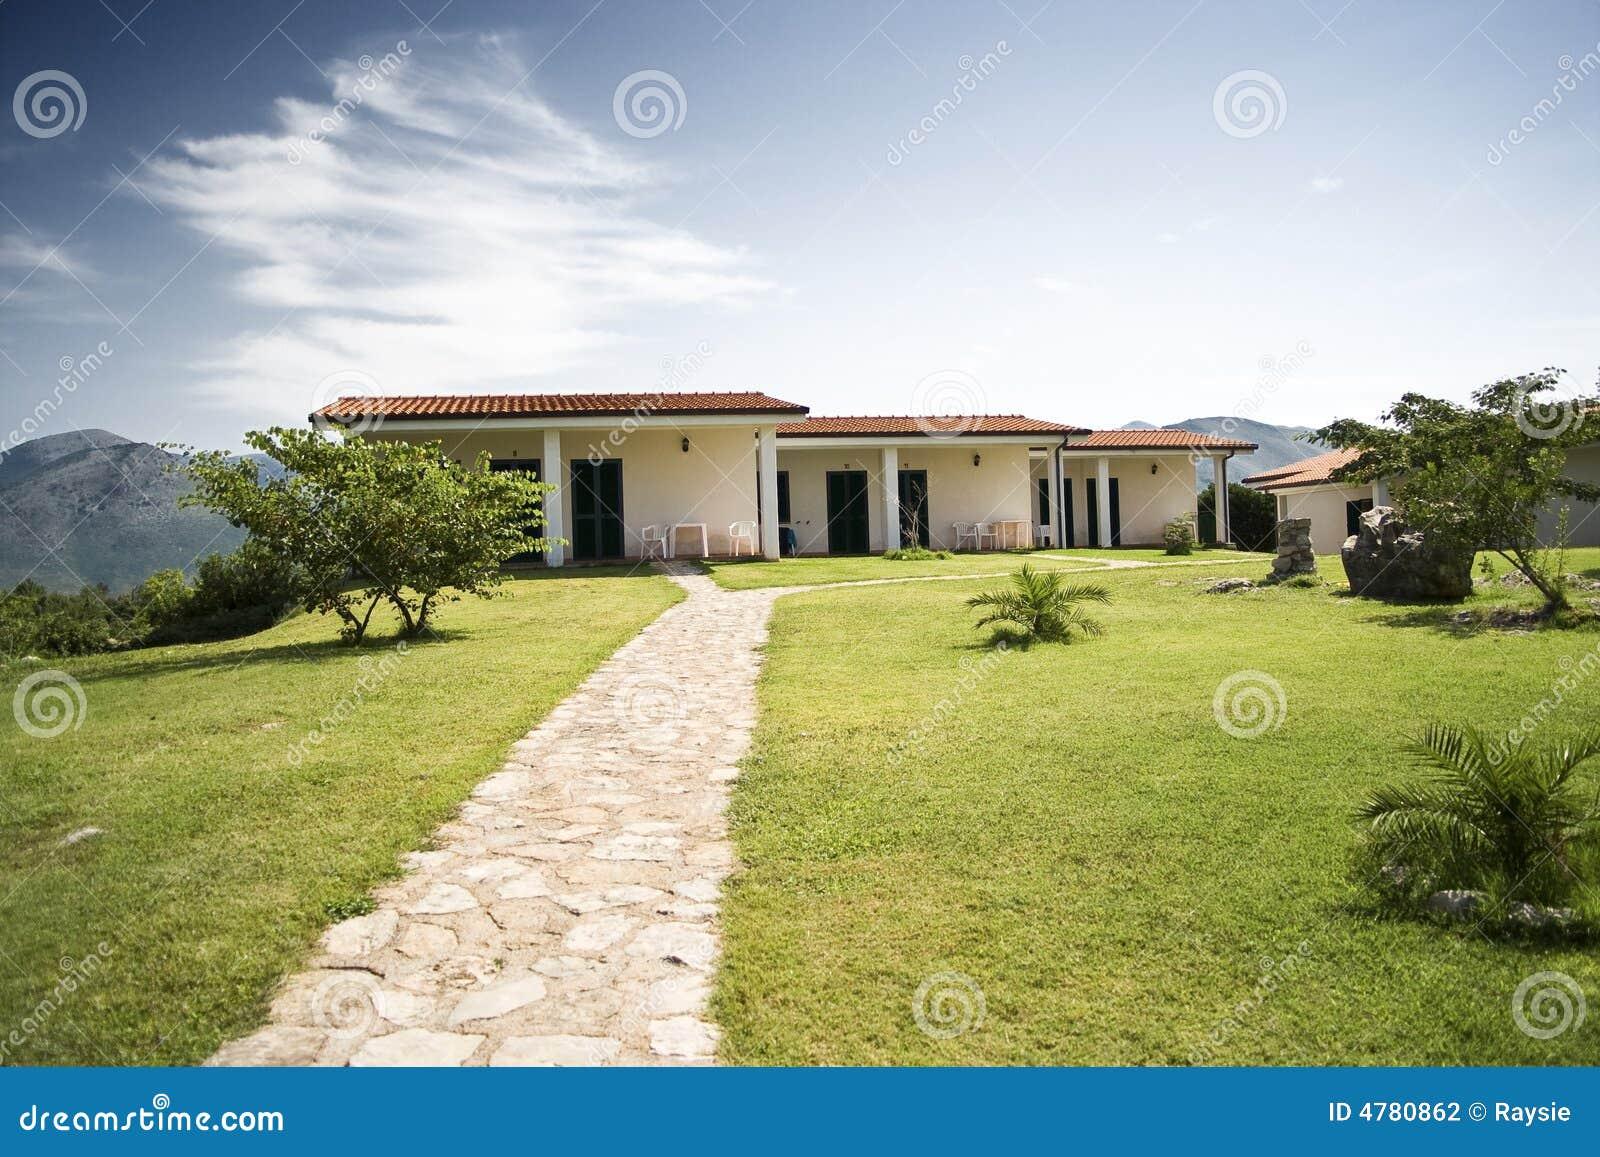 Casas de narcos en mexico com portal pelautscom picture - Casas de una planta ...